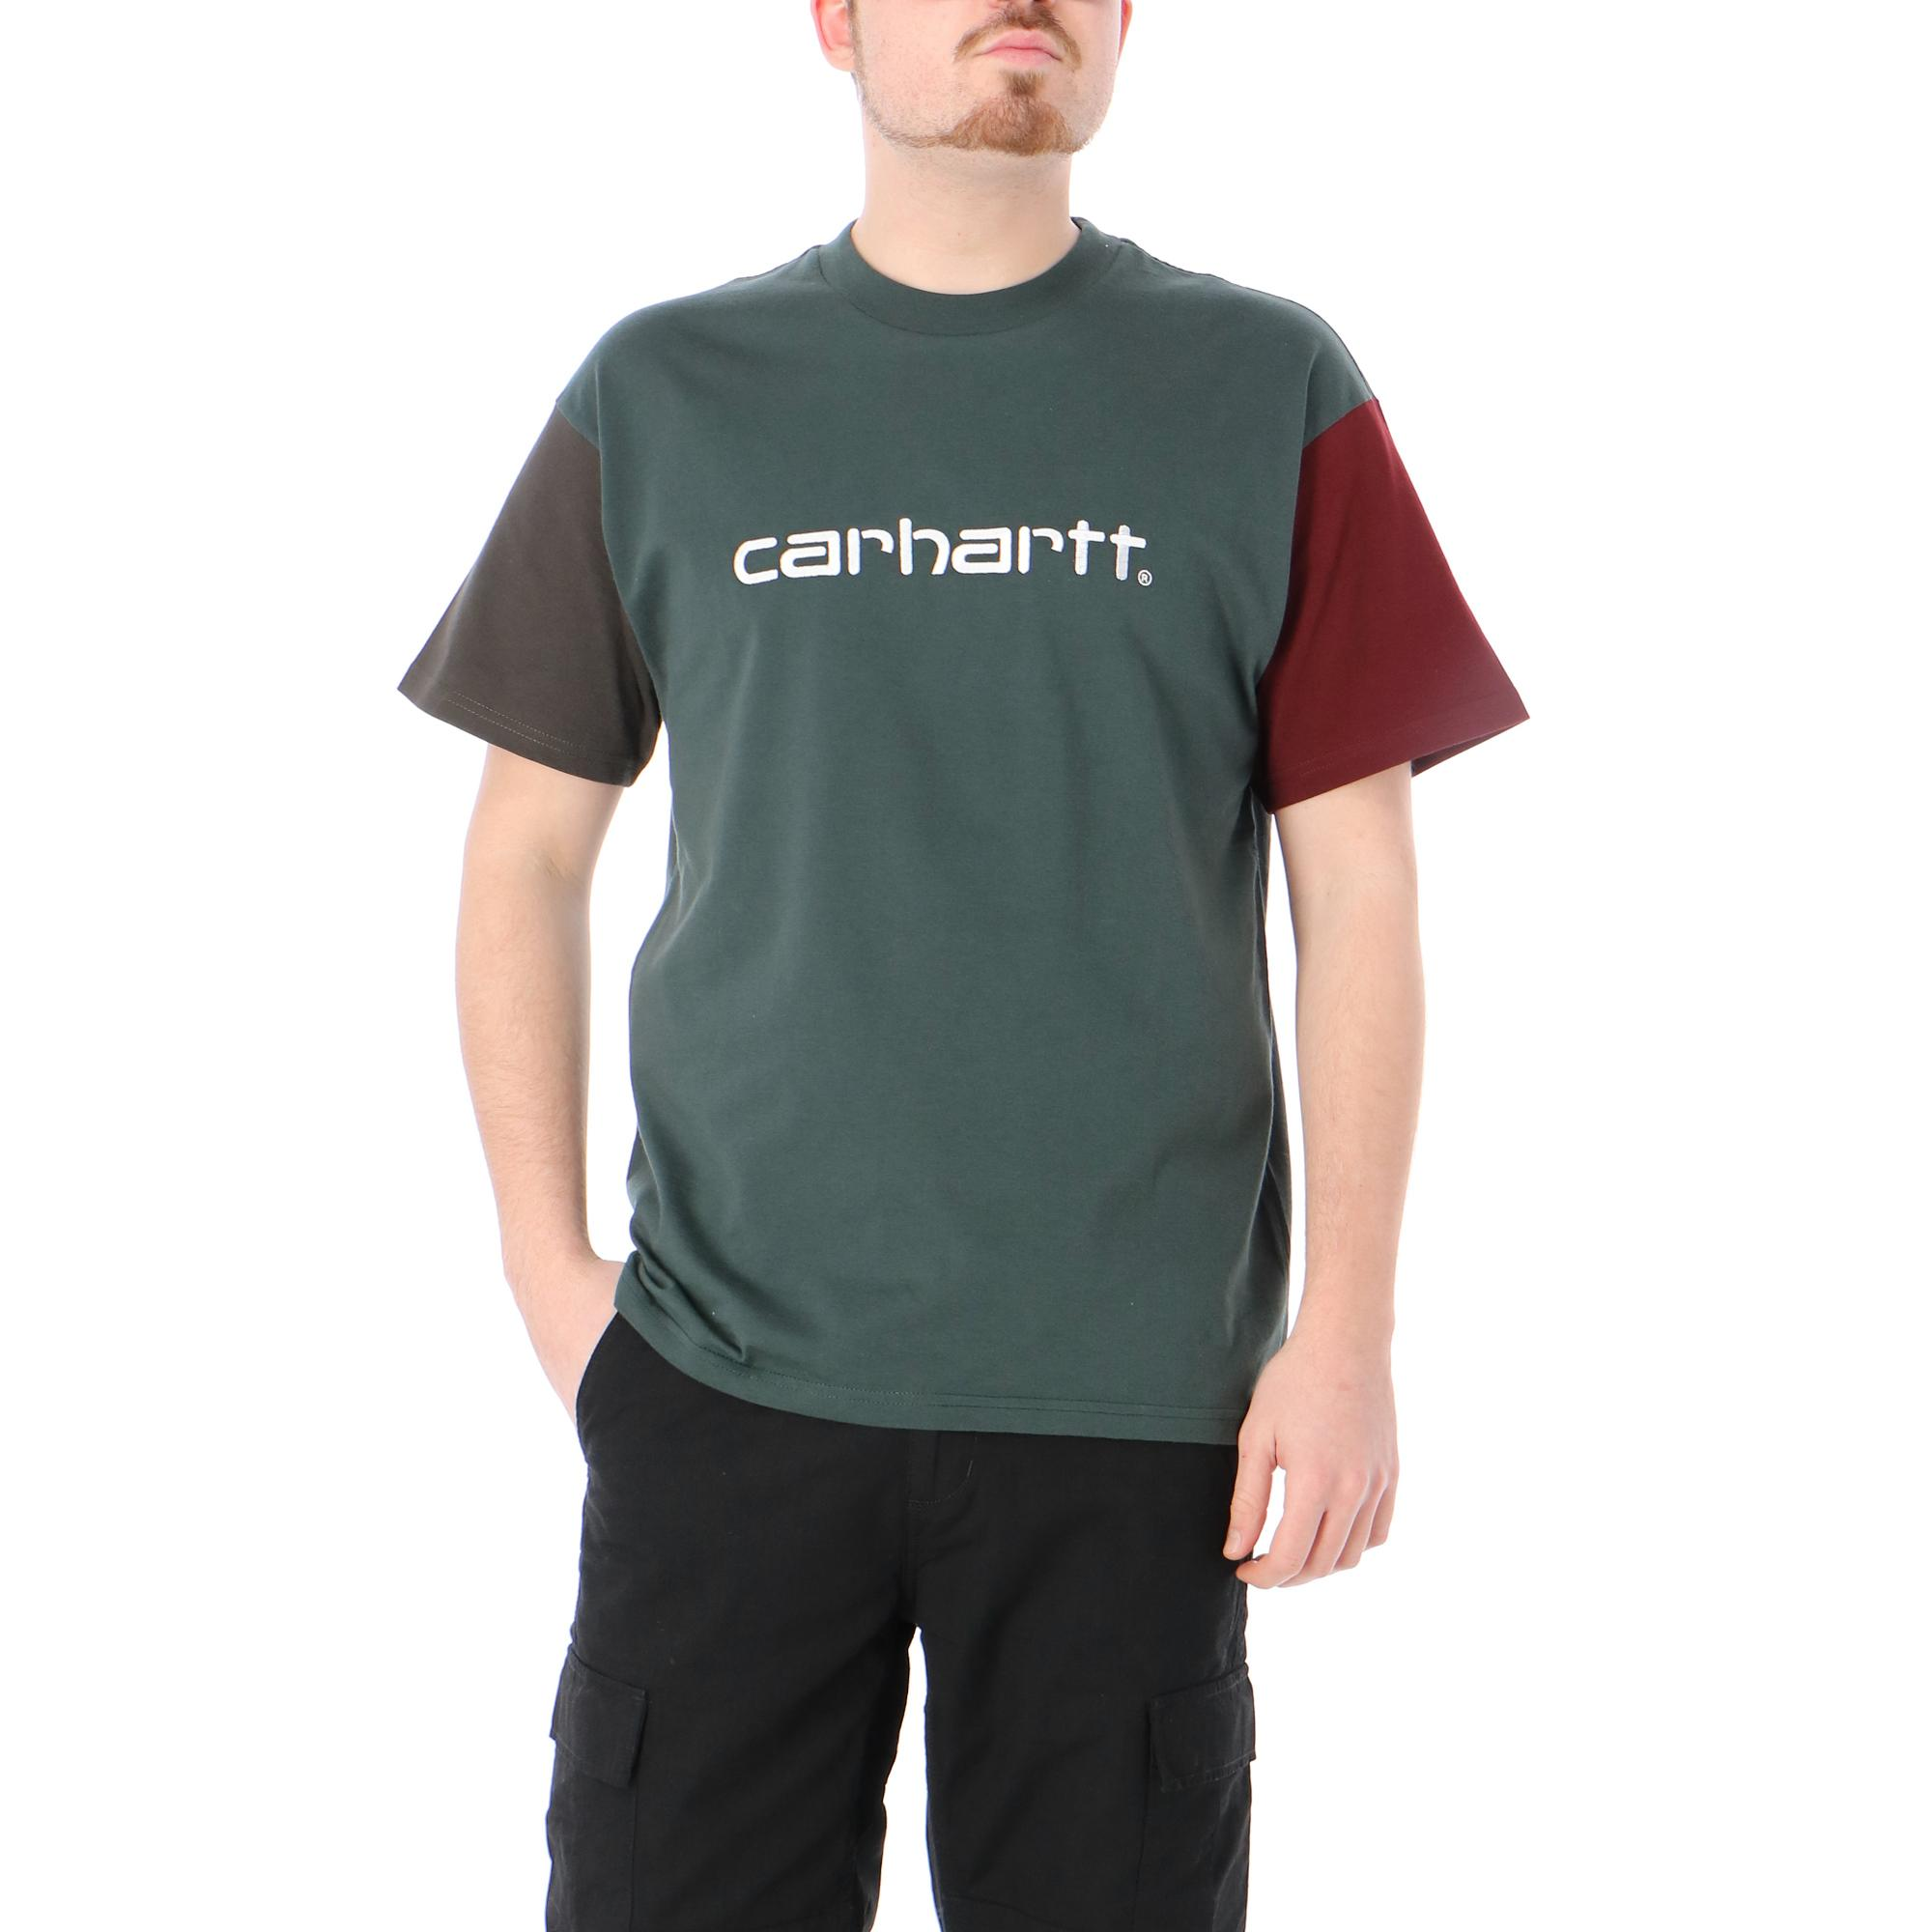 Carhartt S/s Carhartt Tricol T-shirt DARK TEAL